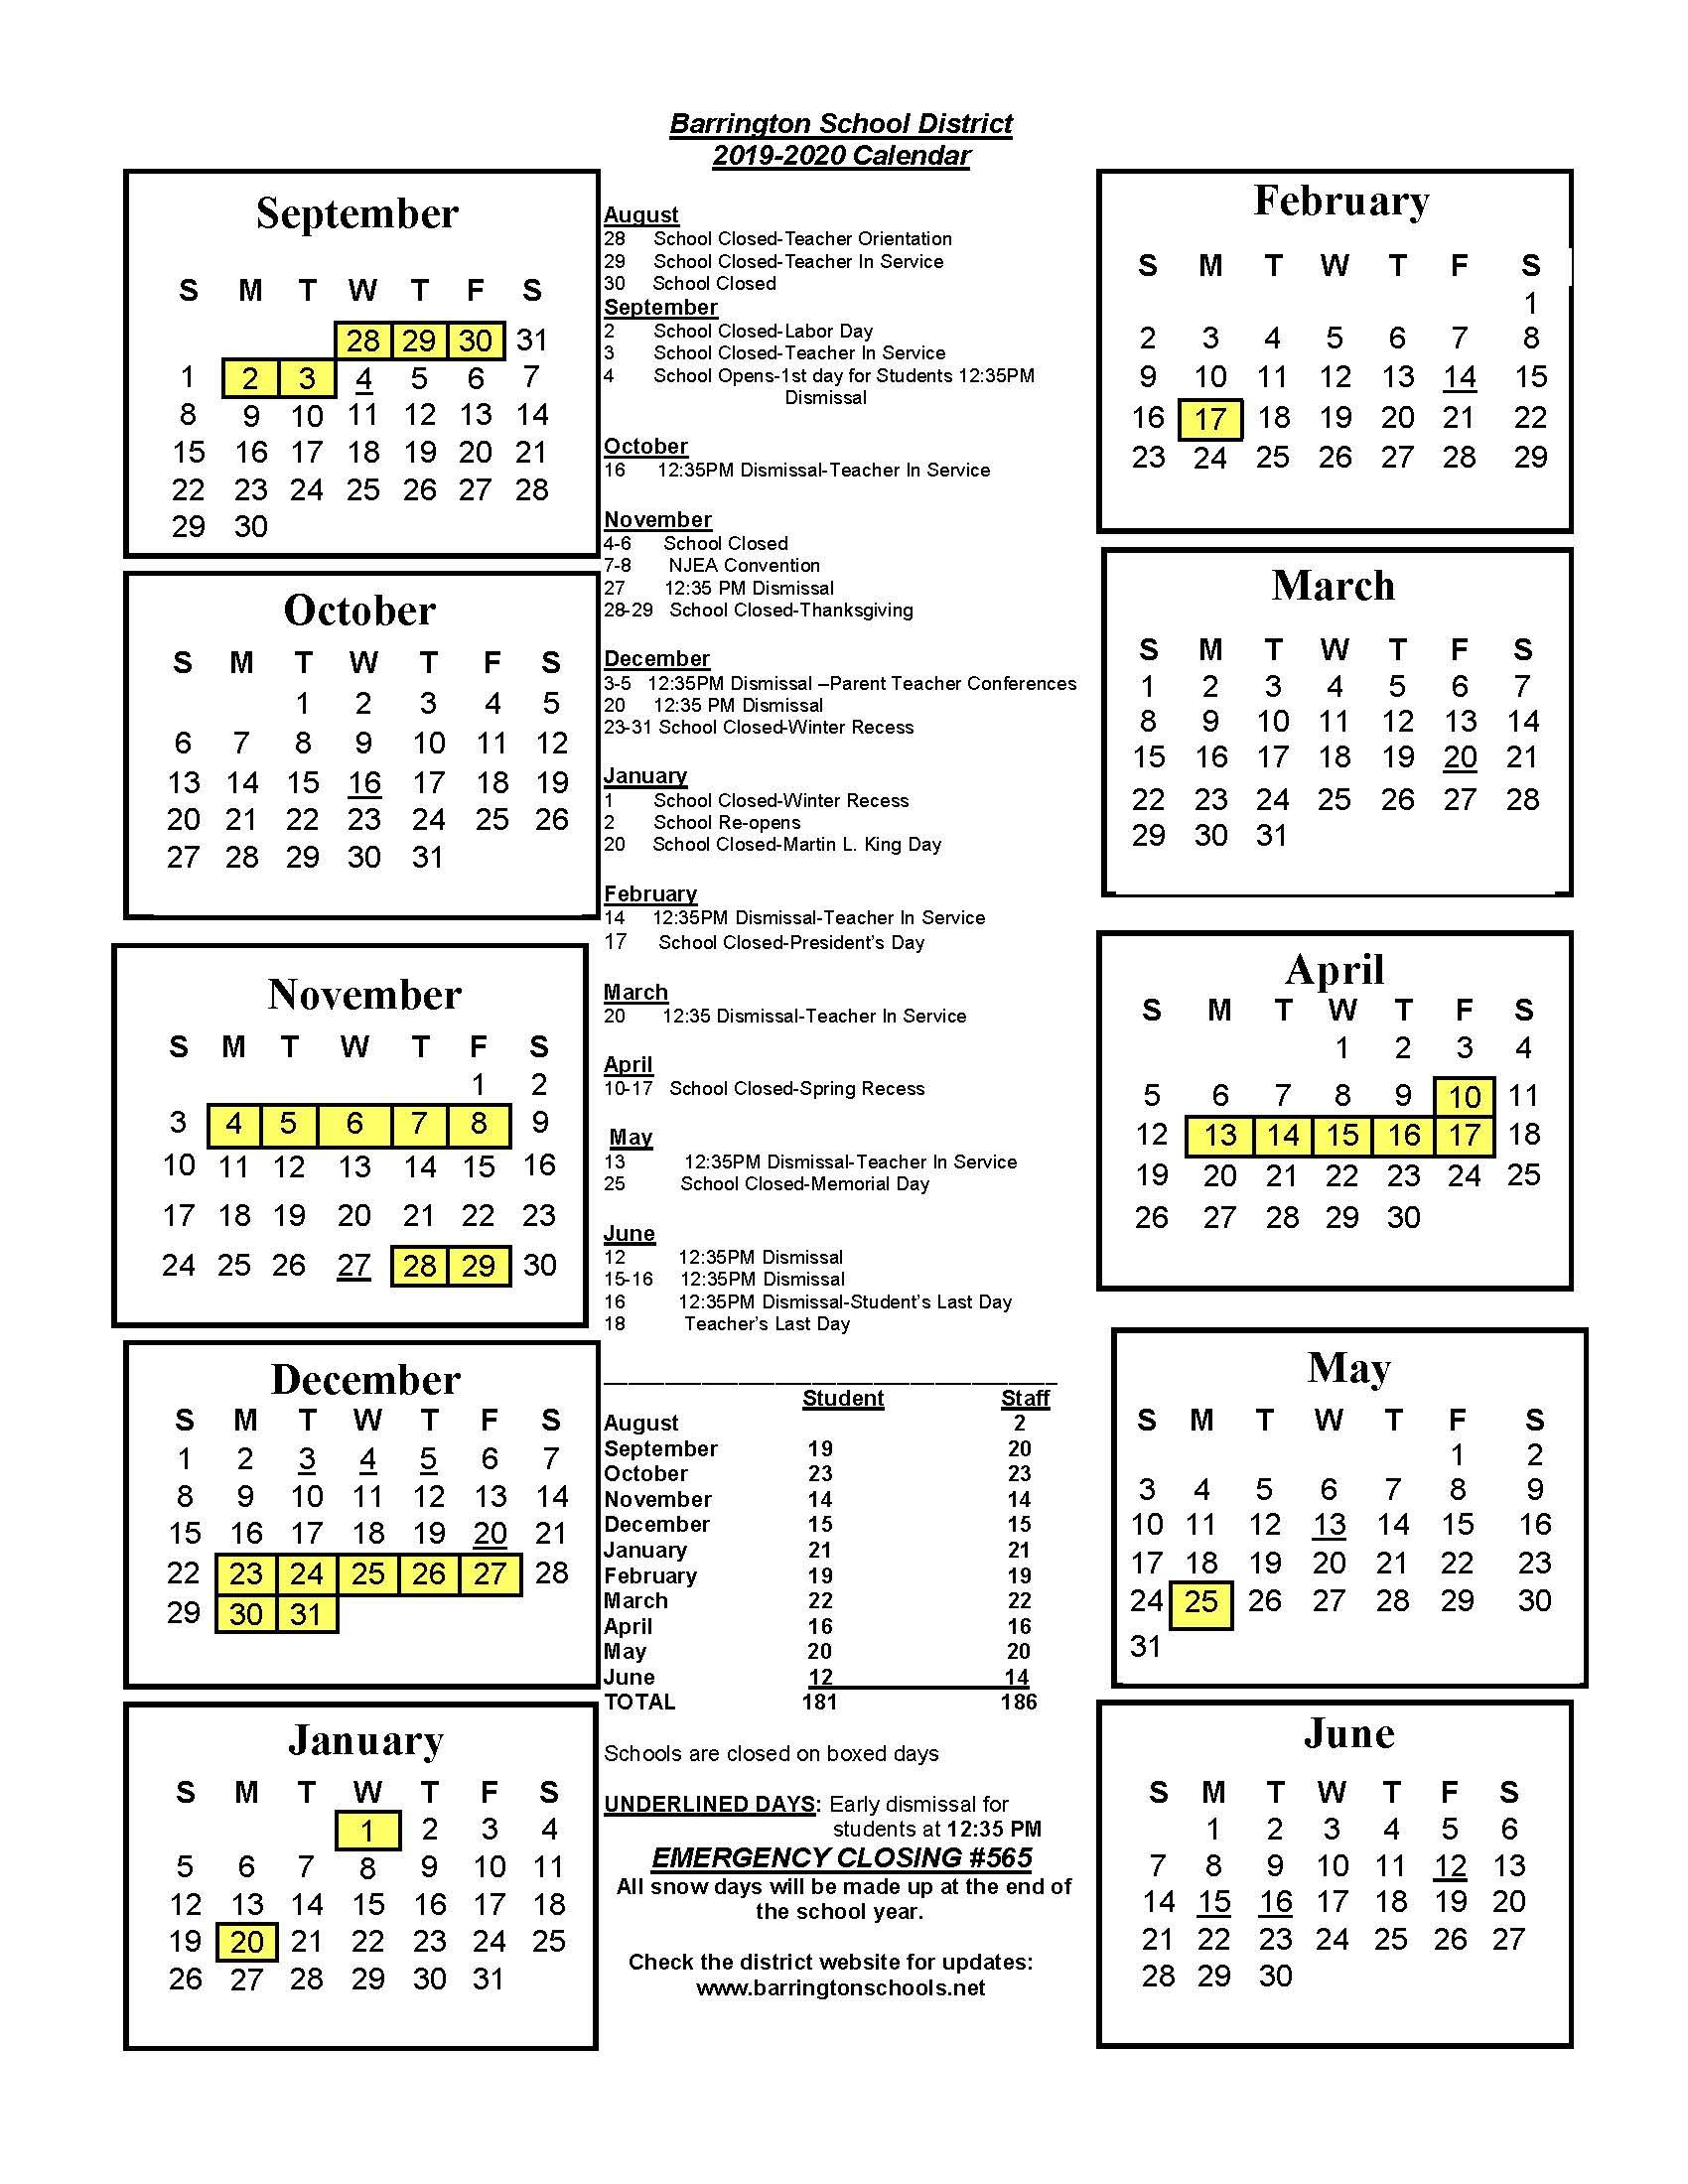 District Calendar - Barrington School District Throughout New Brunswick Public Schools Calendar